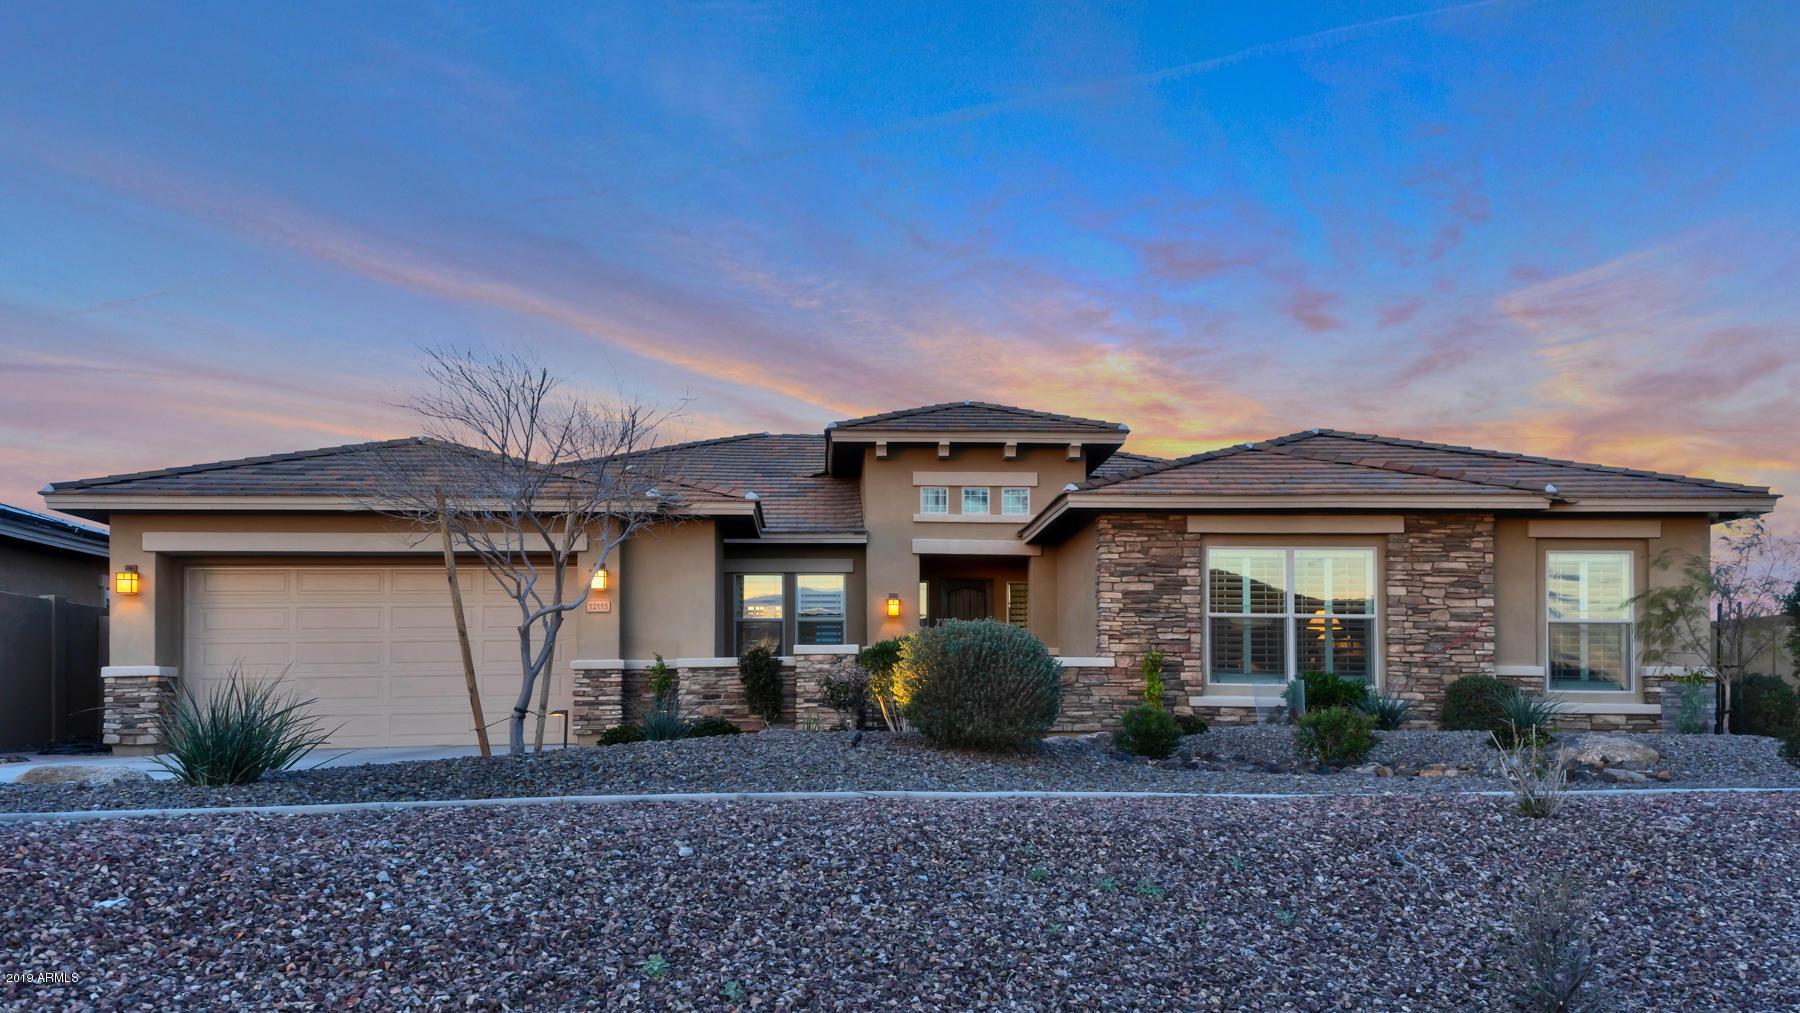 Photo of 12115 S 180th Drive, Goodyear, AZ 85338